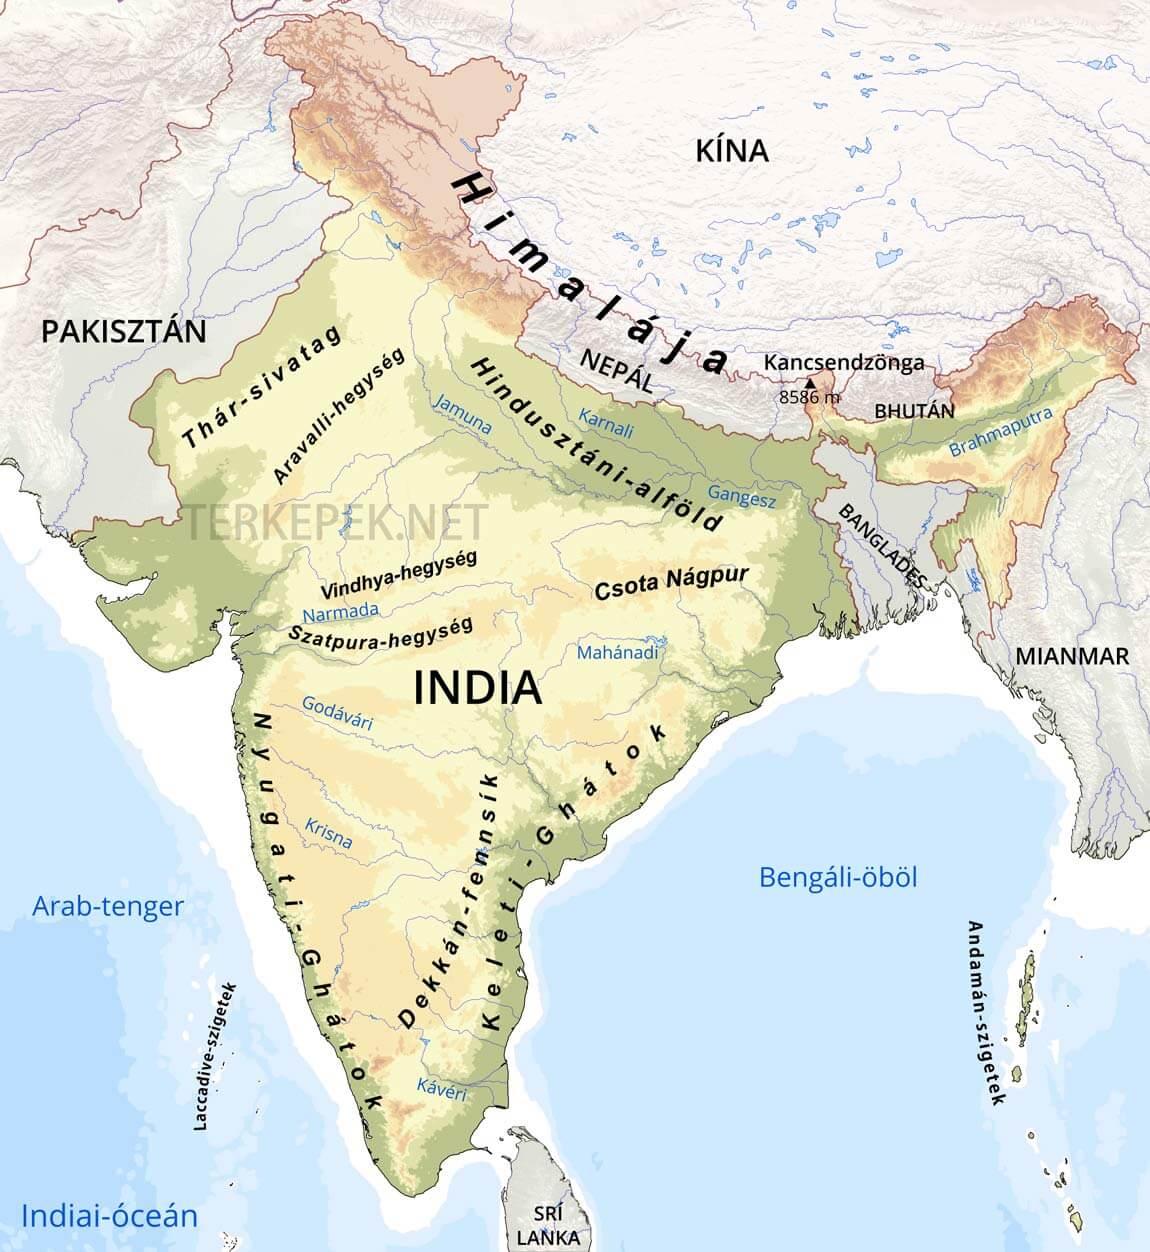 kína domborzati térkép India domborzati térképe kína domborzati térkép